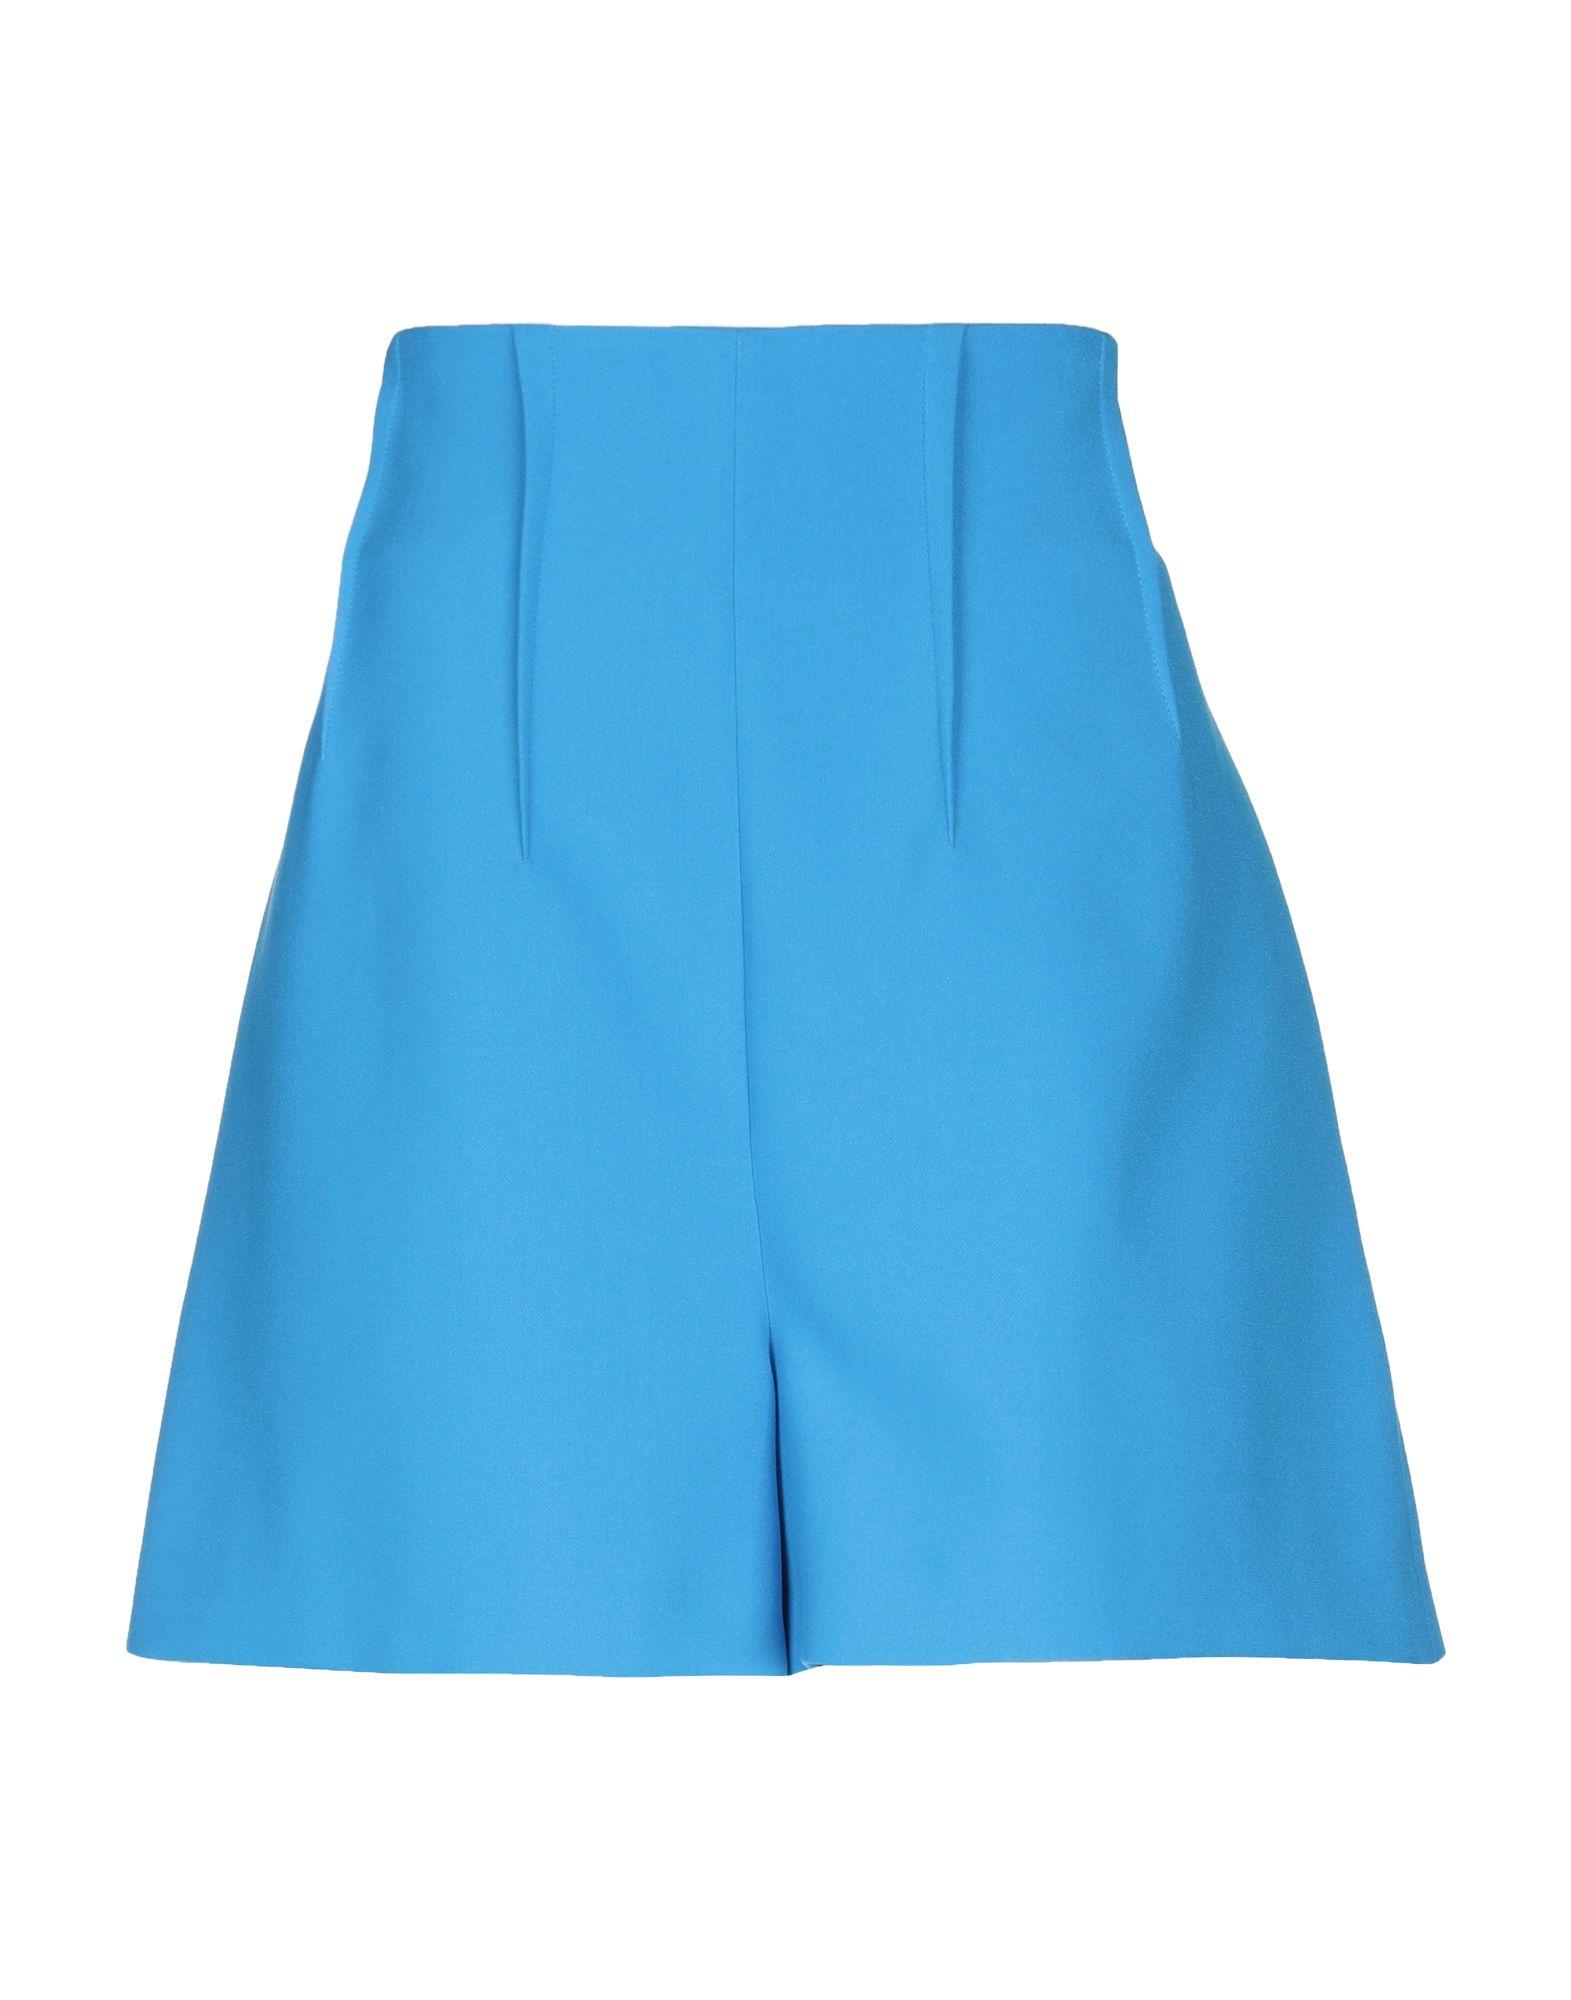 Shorts & Bermuda Versace Versace Collection donna - 13251983RR  Fitness-Händler